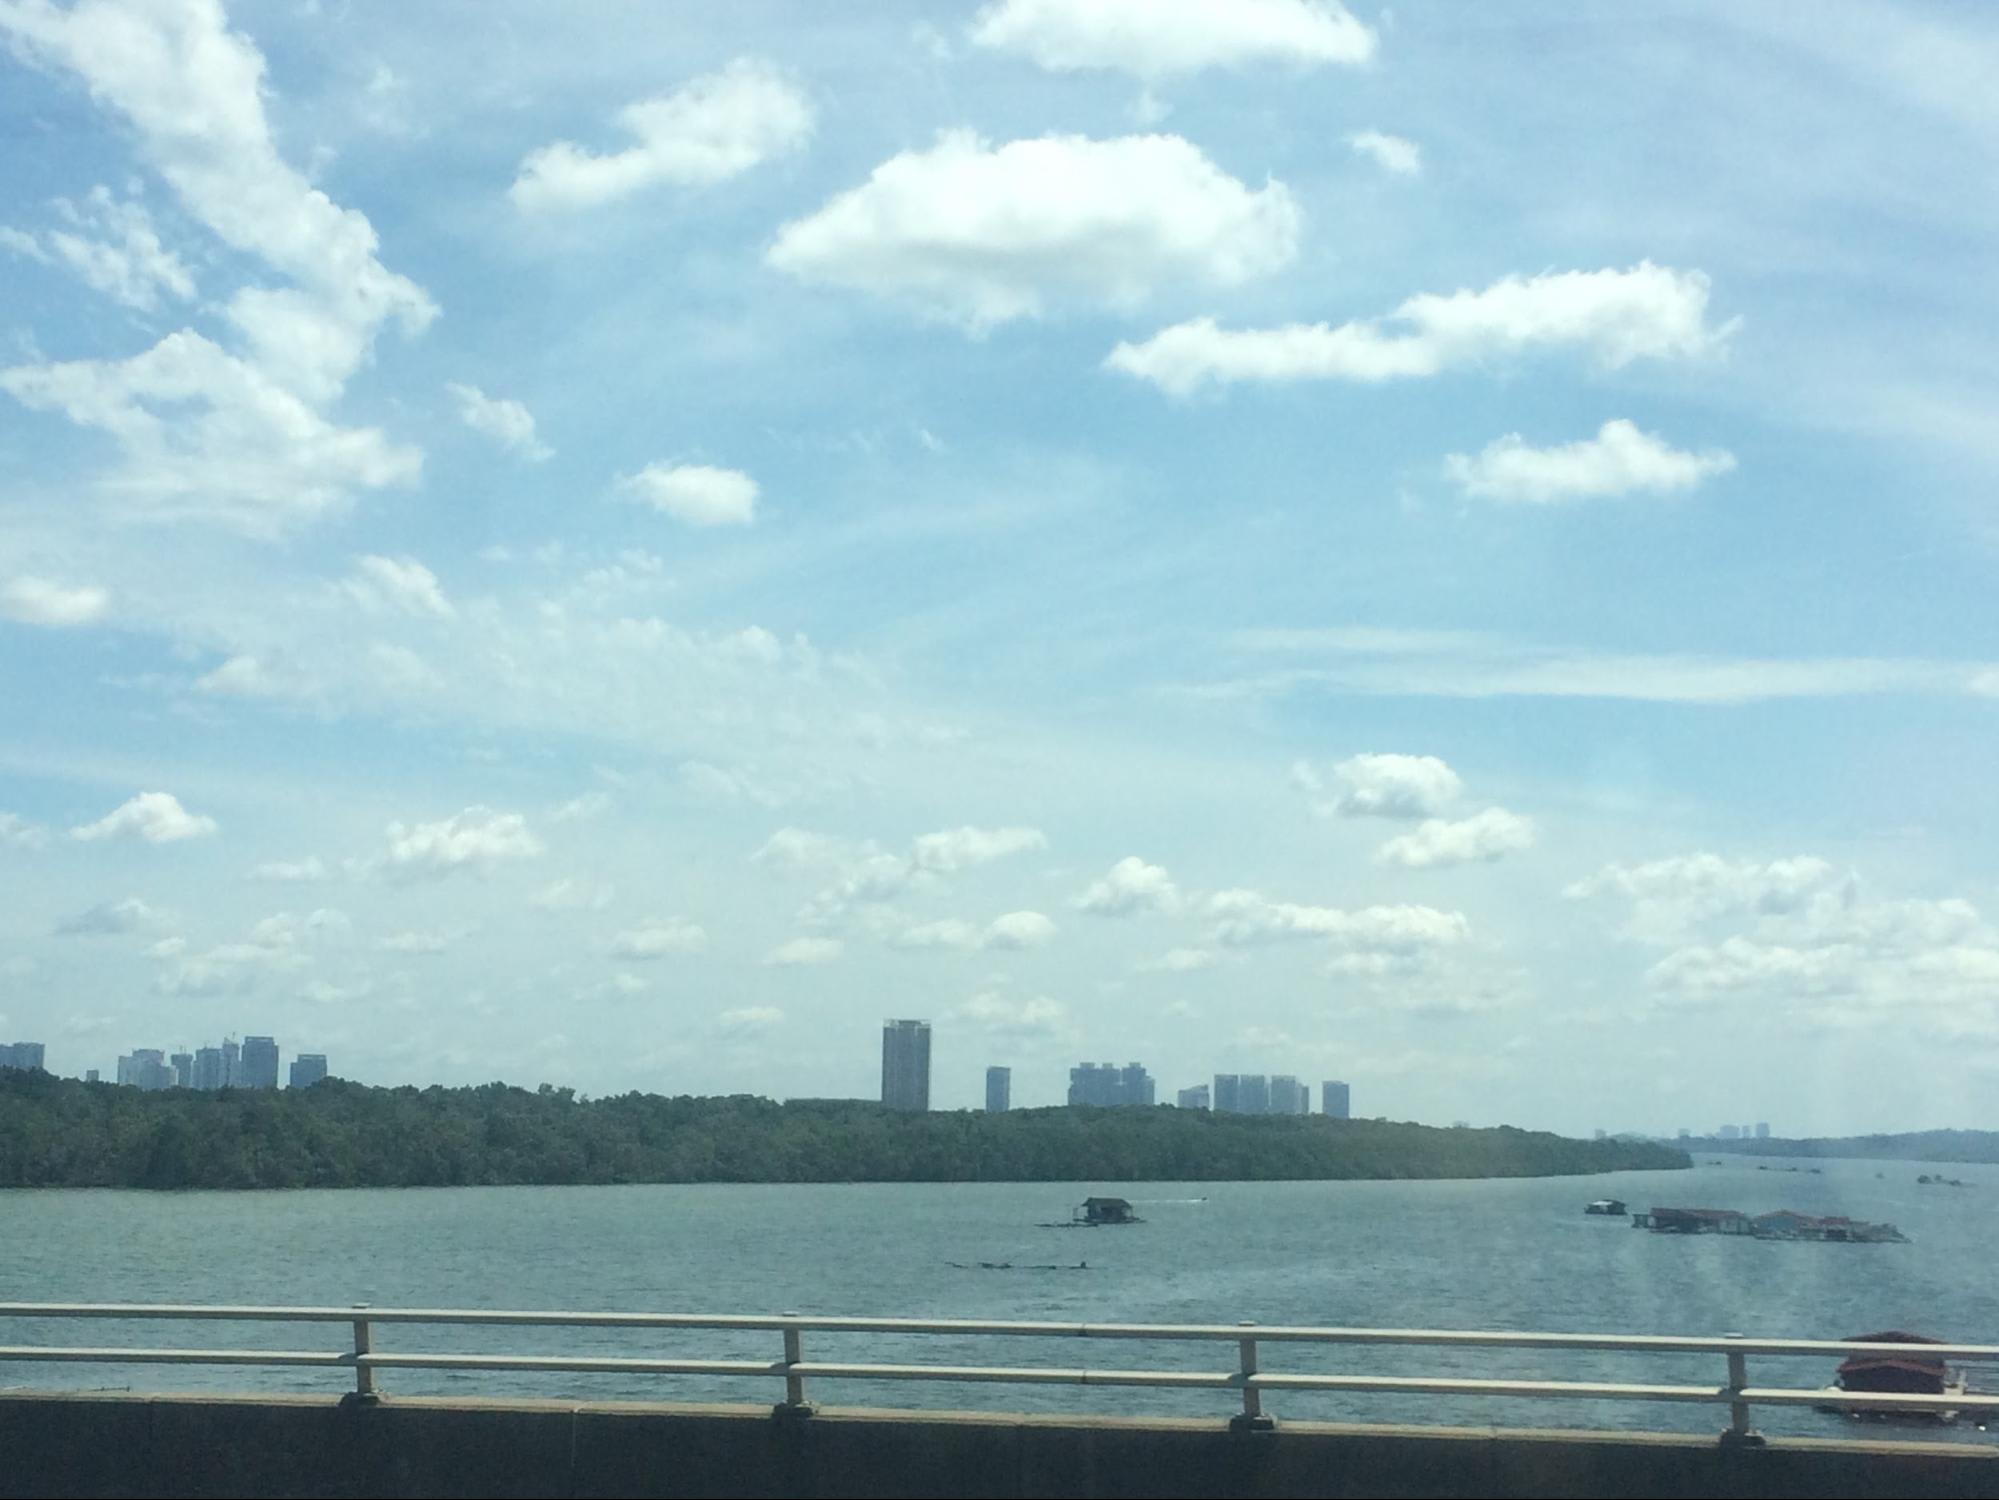 cầu nối giữa singapore và malaysia